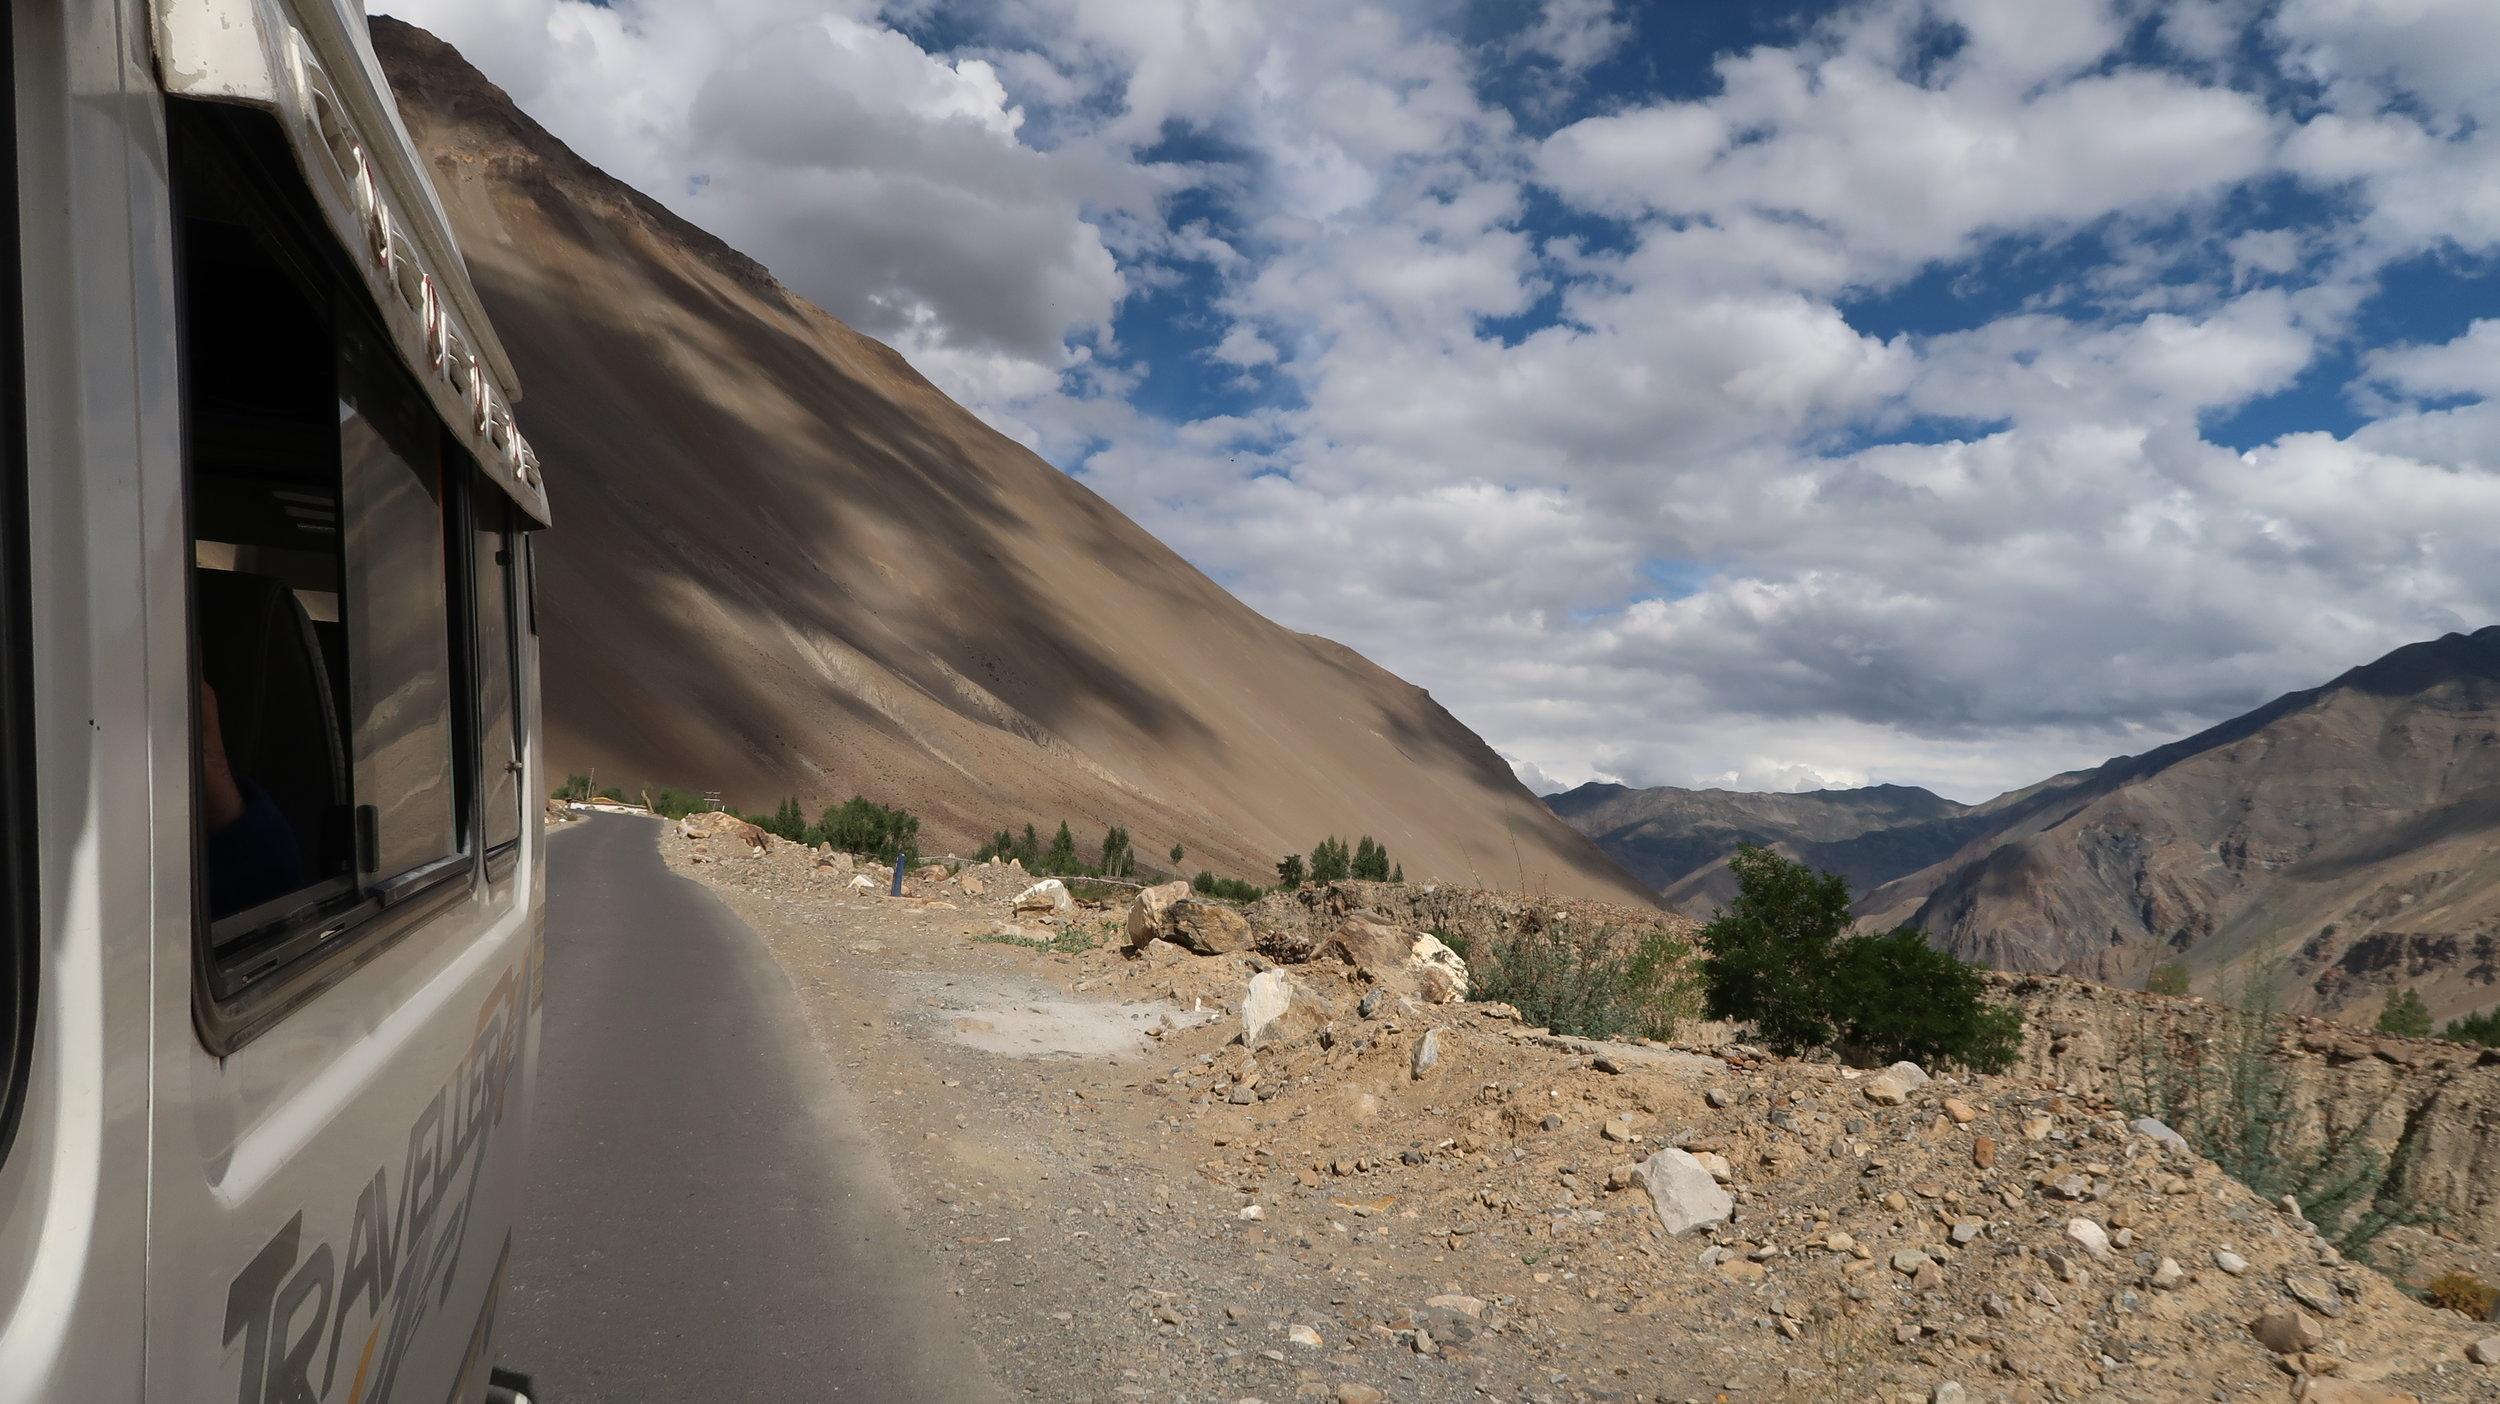 Roads of Spiti Valley